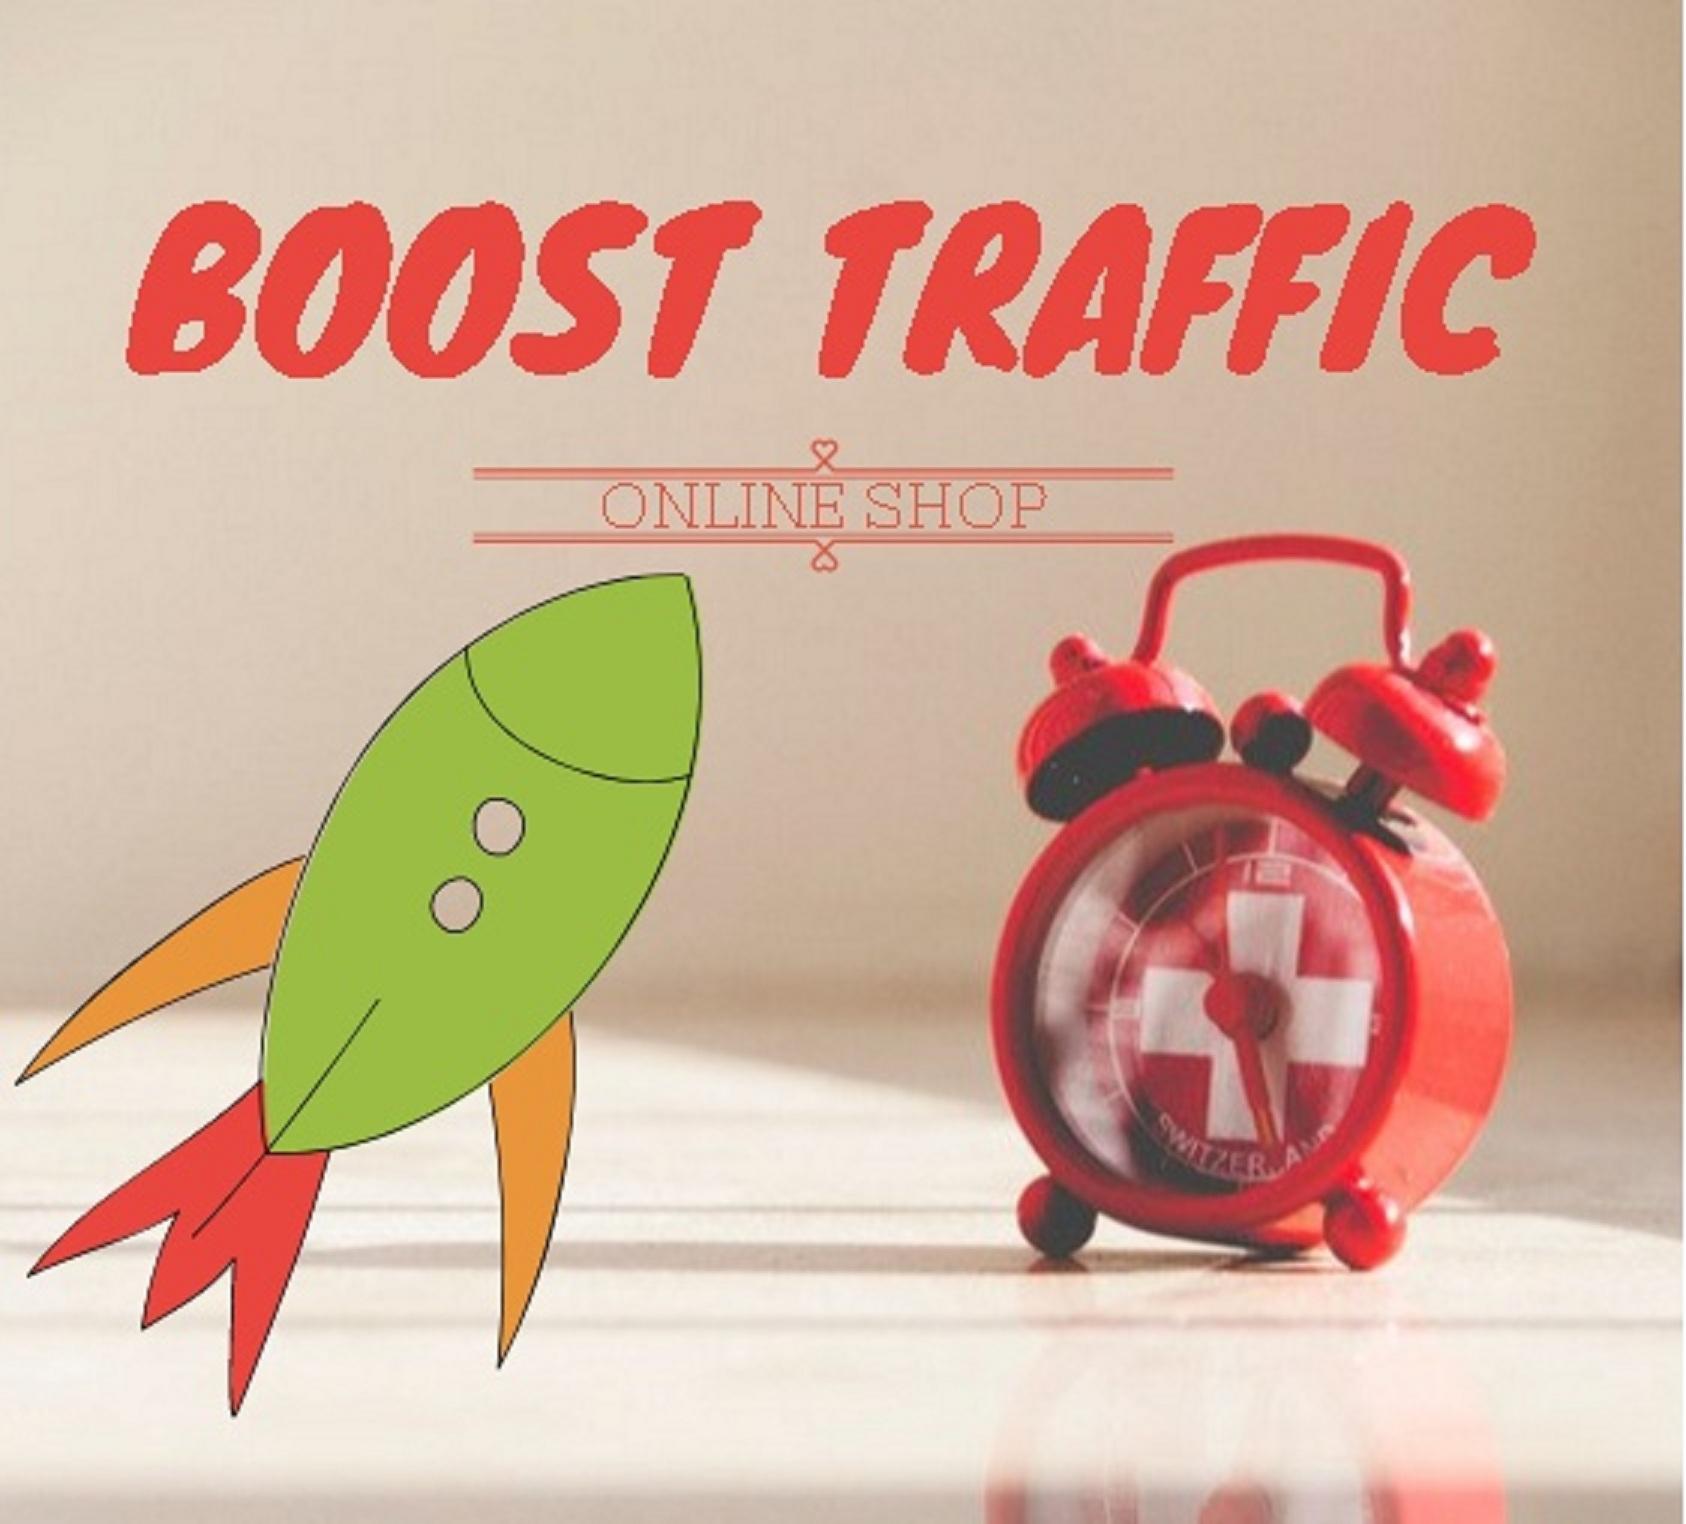 drive seo Americas  Quality Traffic to alibaba shopify Etsy Ebay Amazon ecommerce shop listing Product